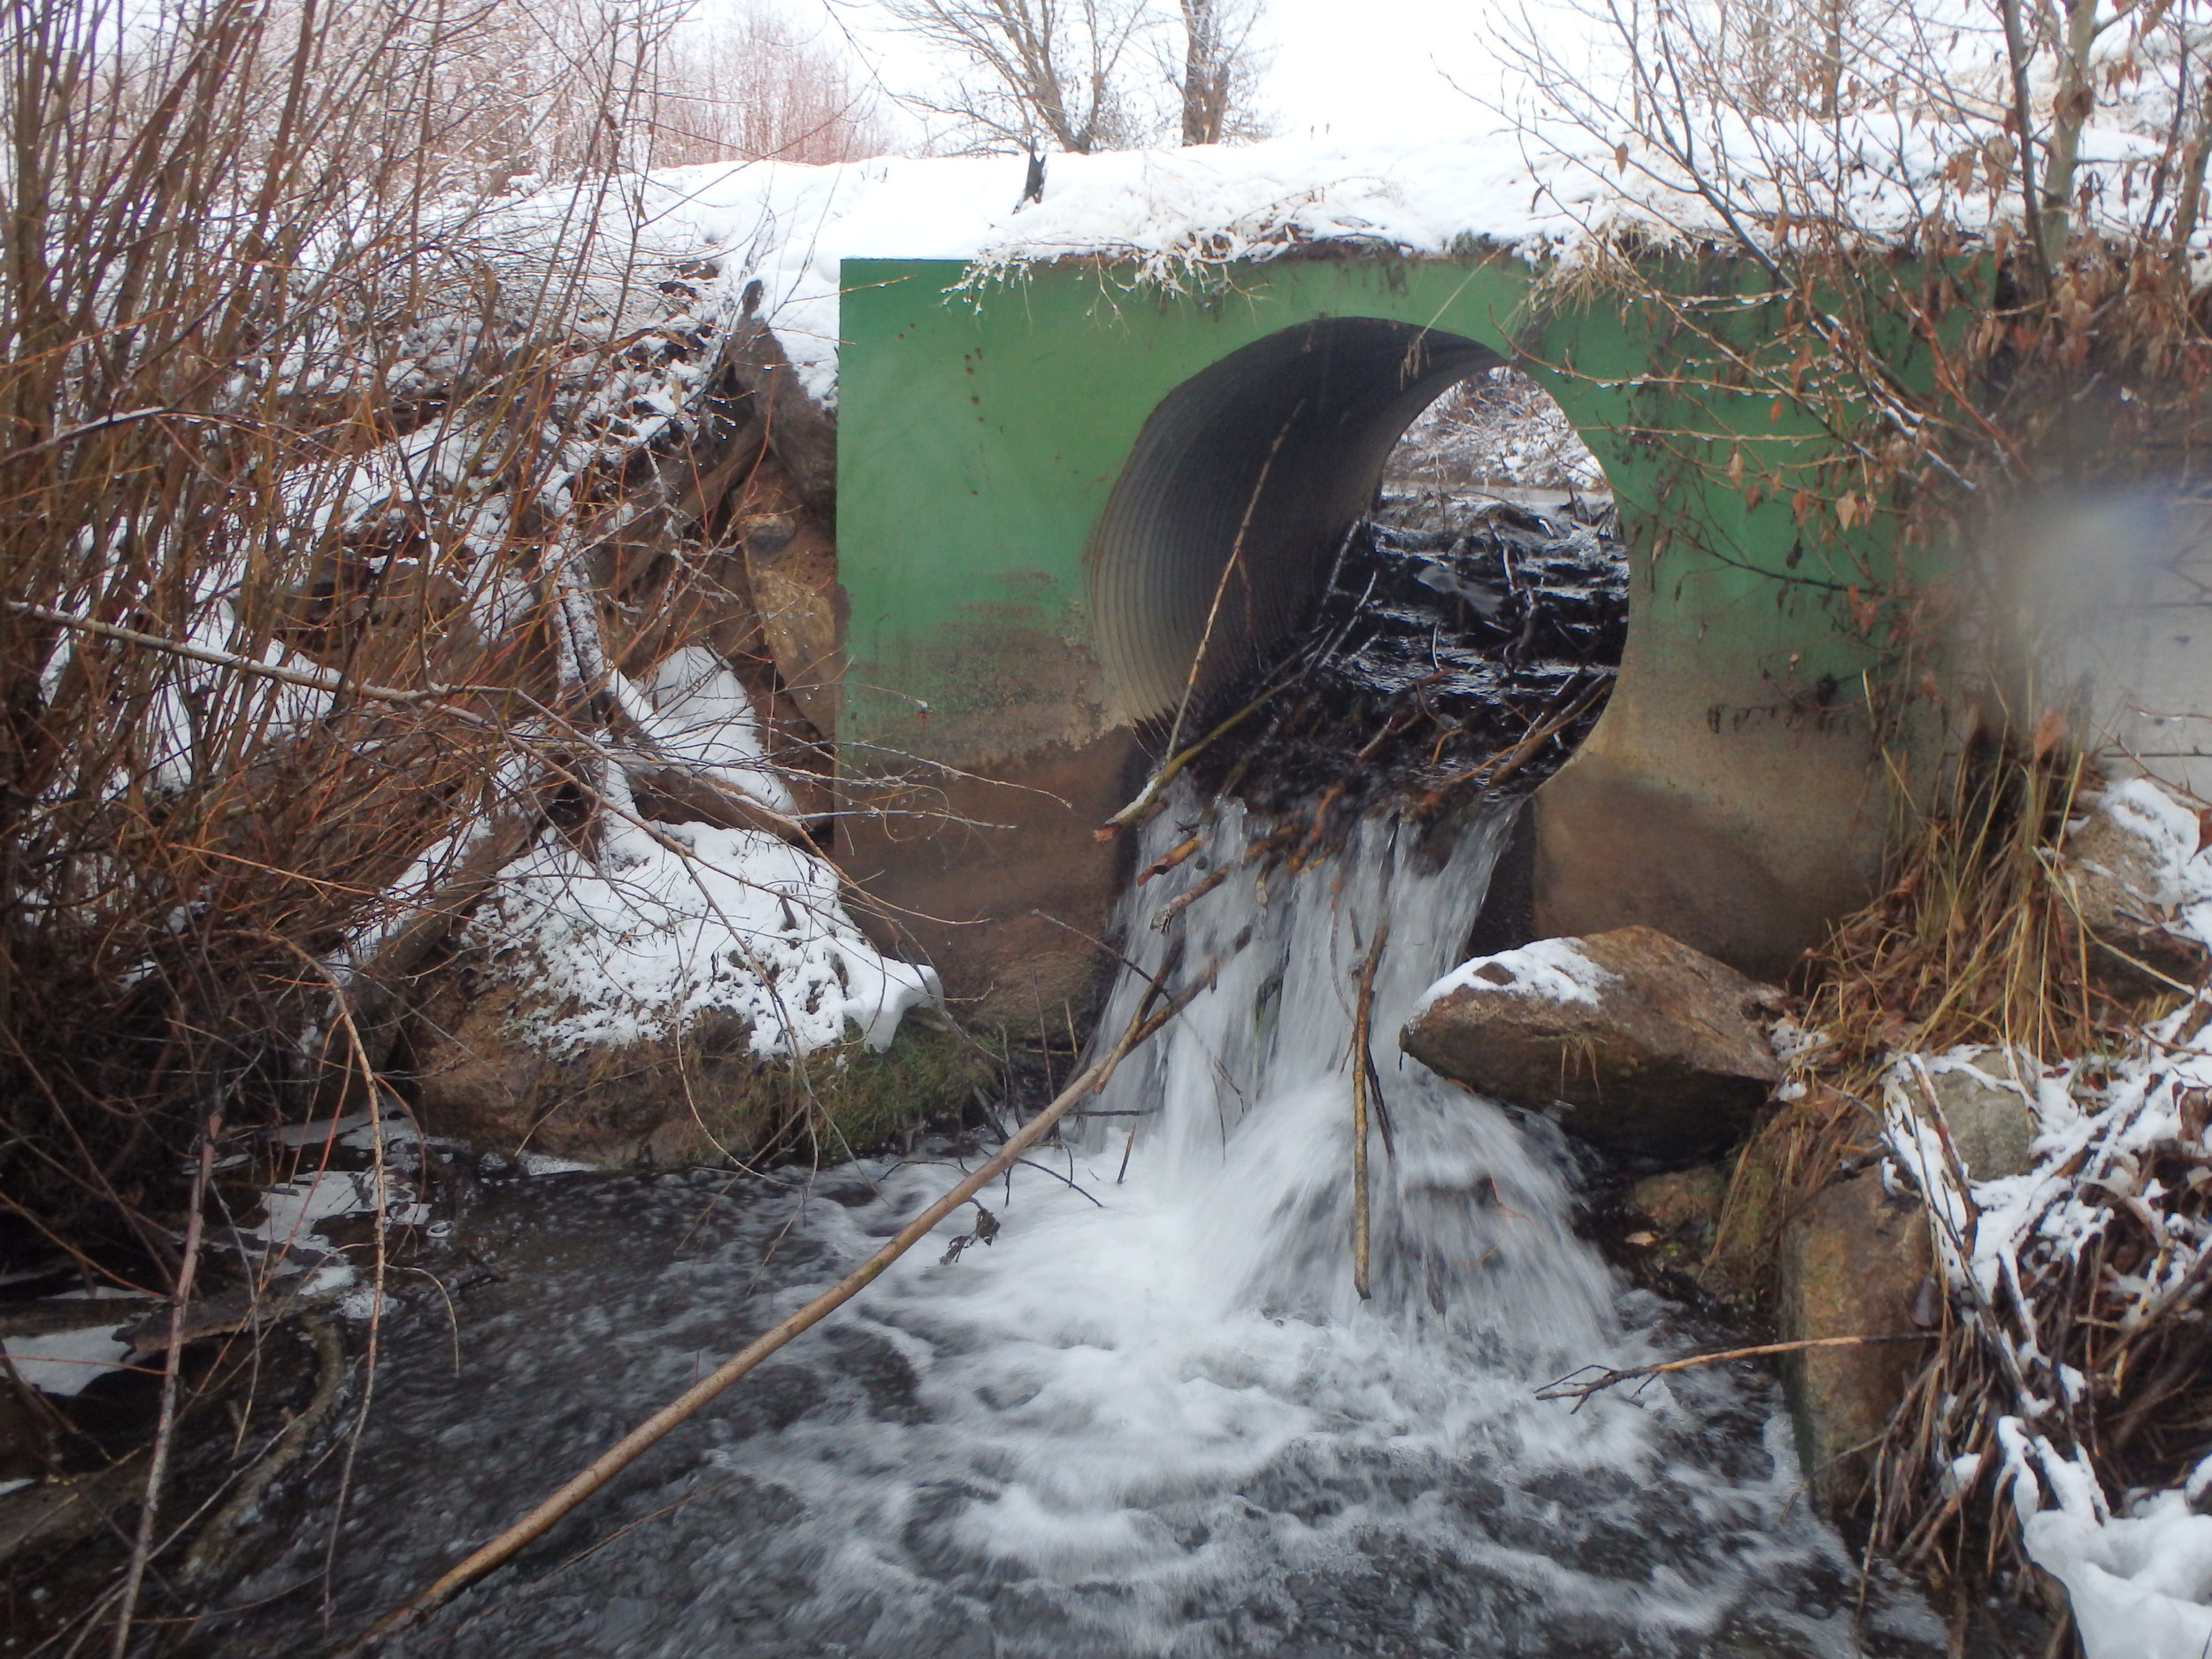 Culvert / irrigation control structure that is a barrier to fish passage - stream restoration